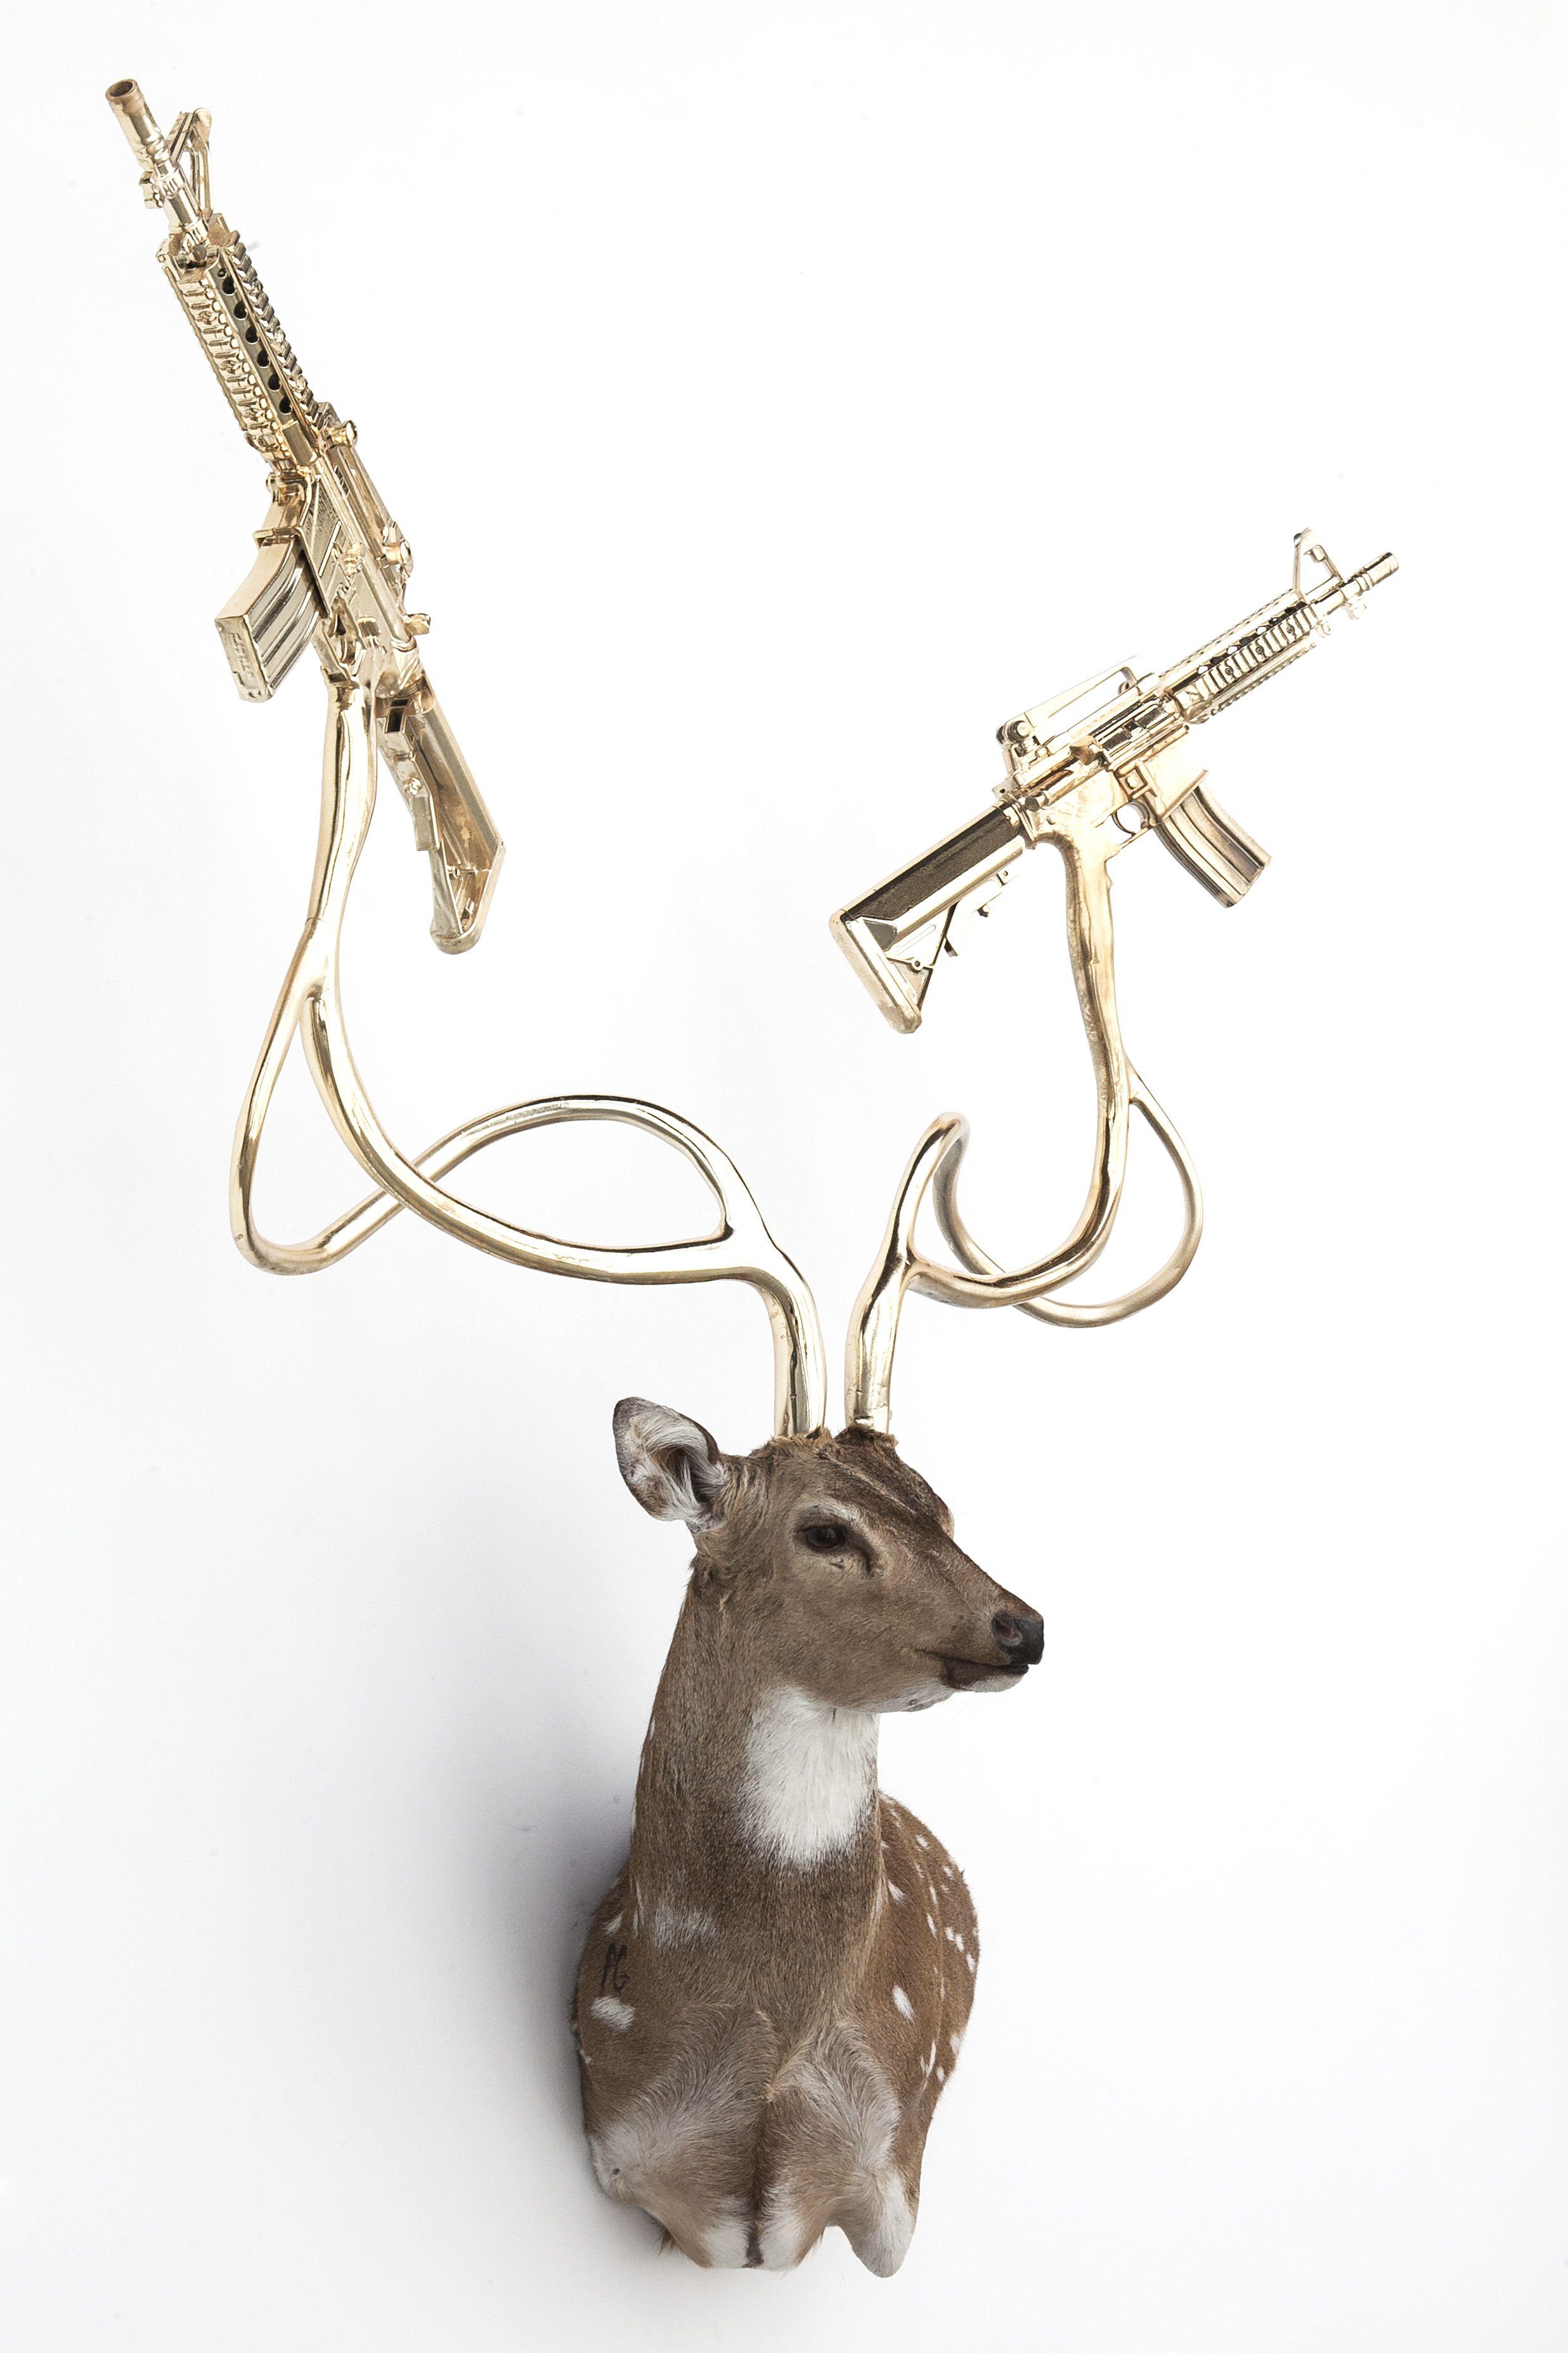 Untitled (Axis Deer) - Mixed media taxidermy Axis Deer sculpture ...